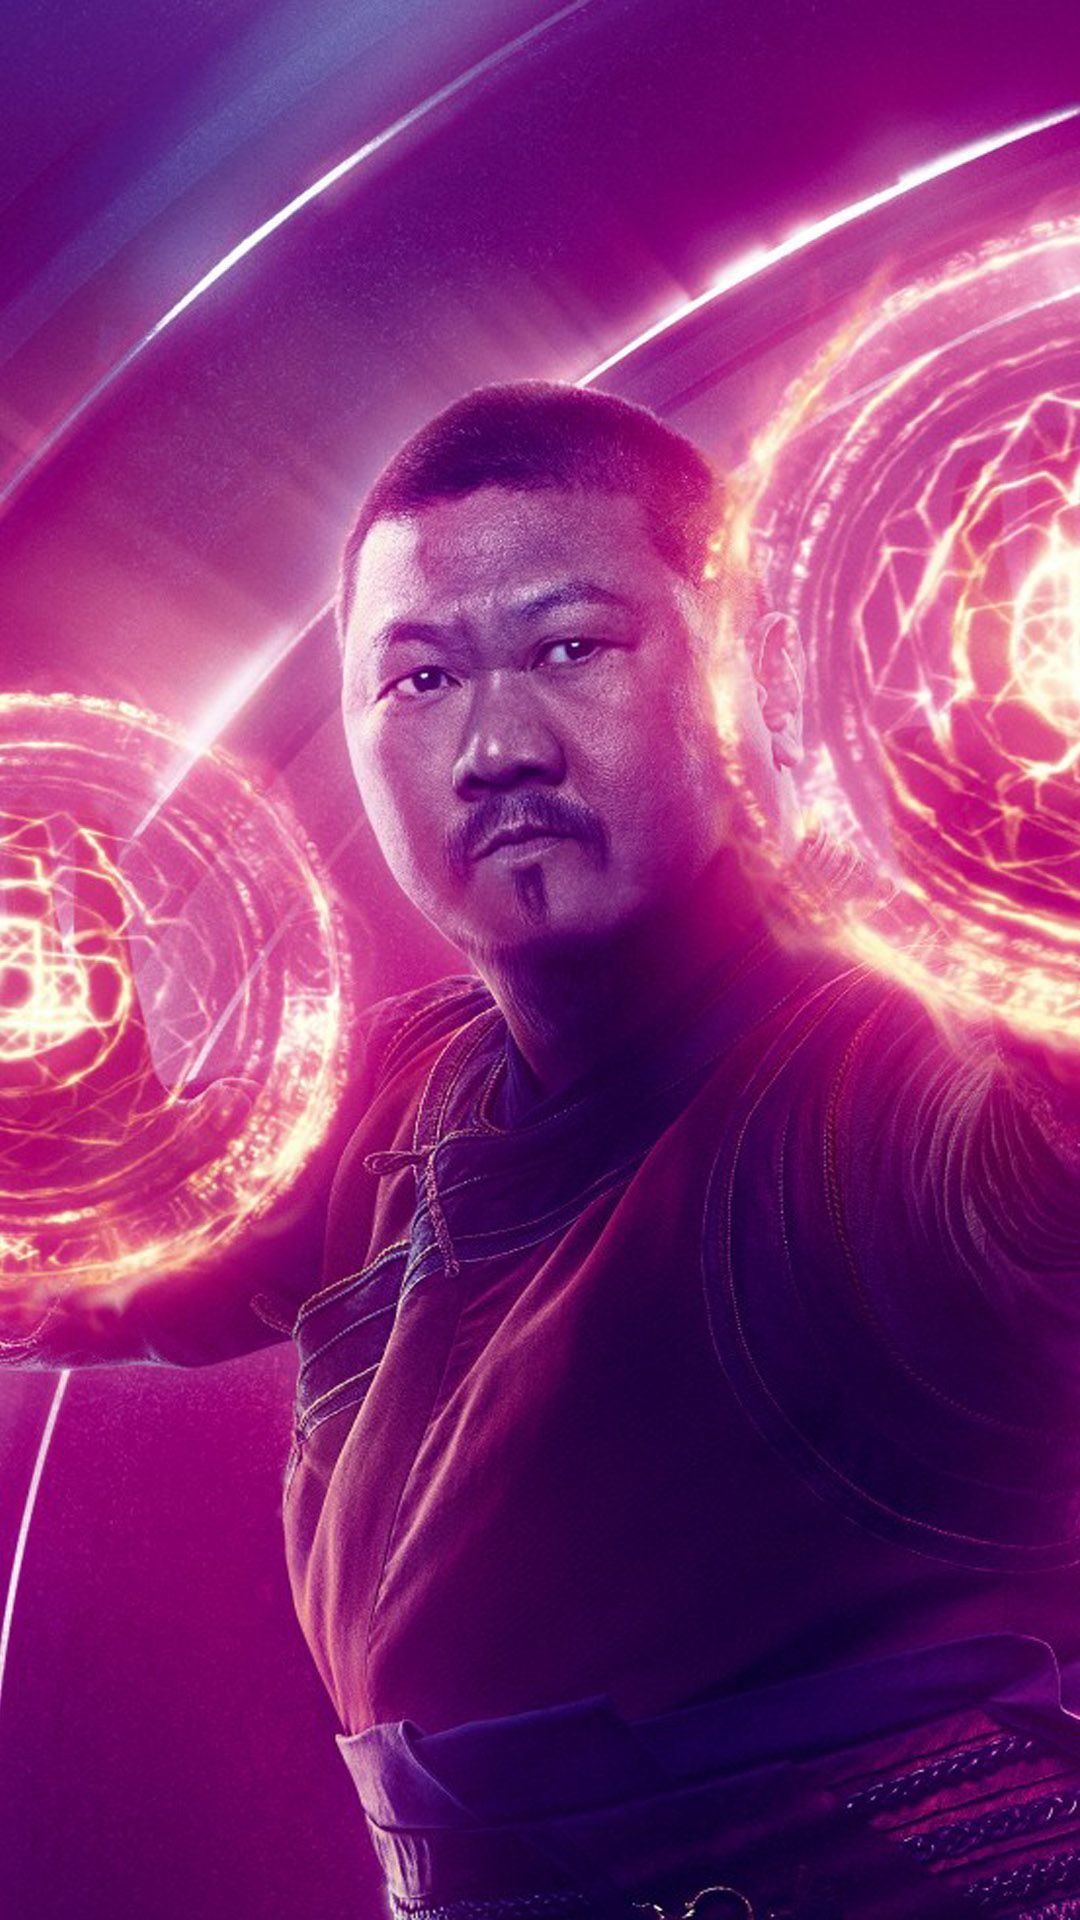 Wong In Avengers Infinity War Marvel Avengers Infinity War